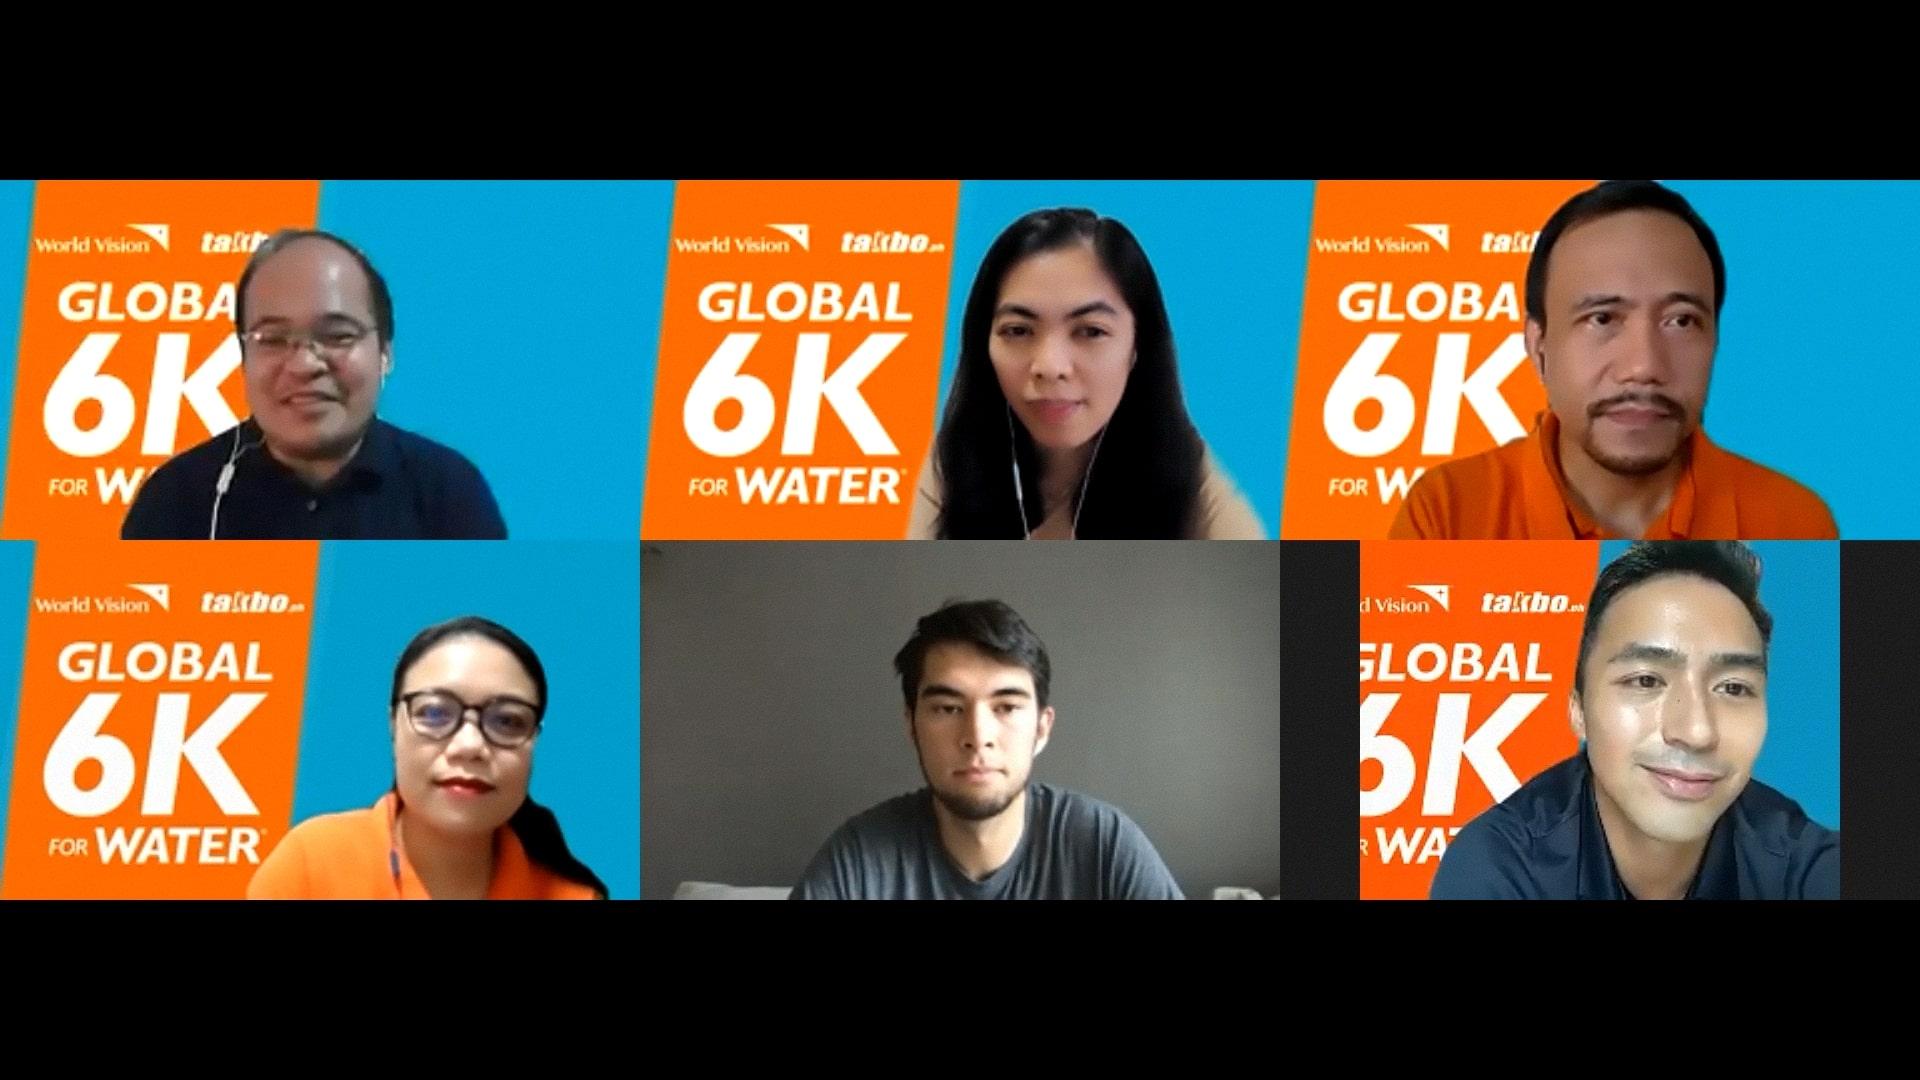 ComCo Southeast Asia New PR Smart Social Global 6k Run